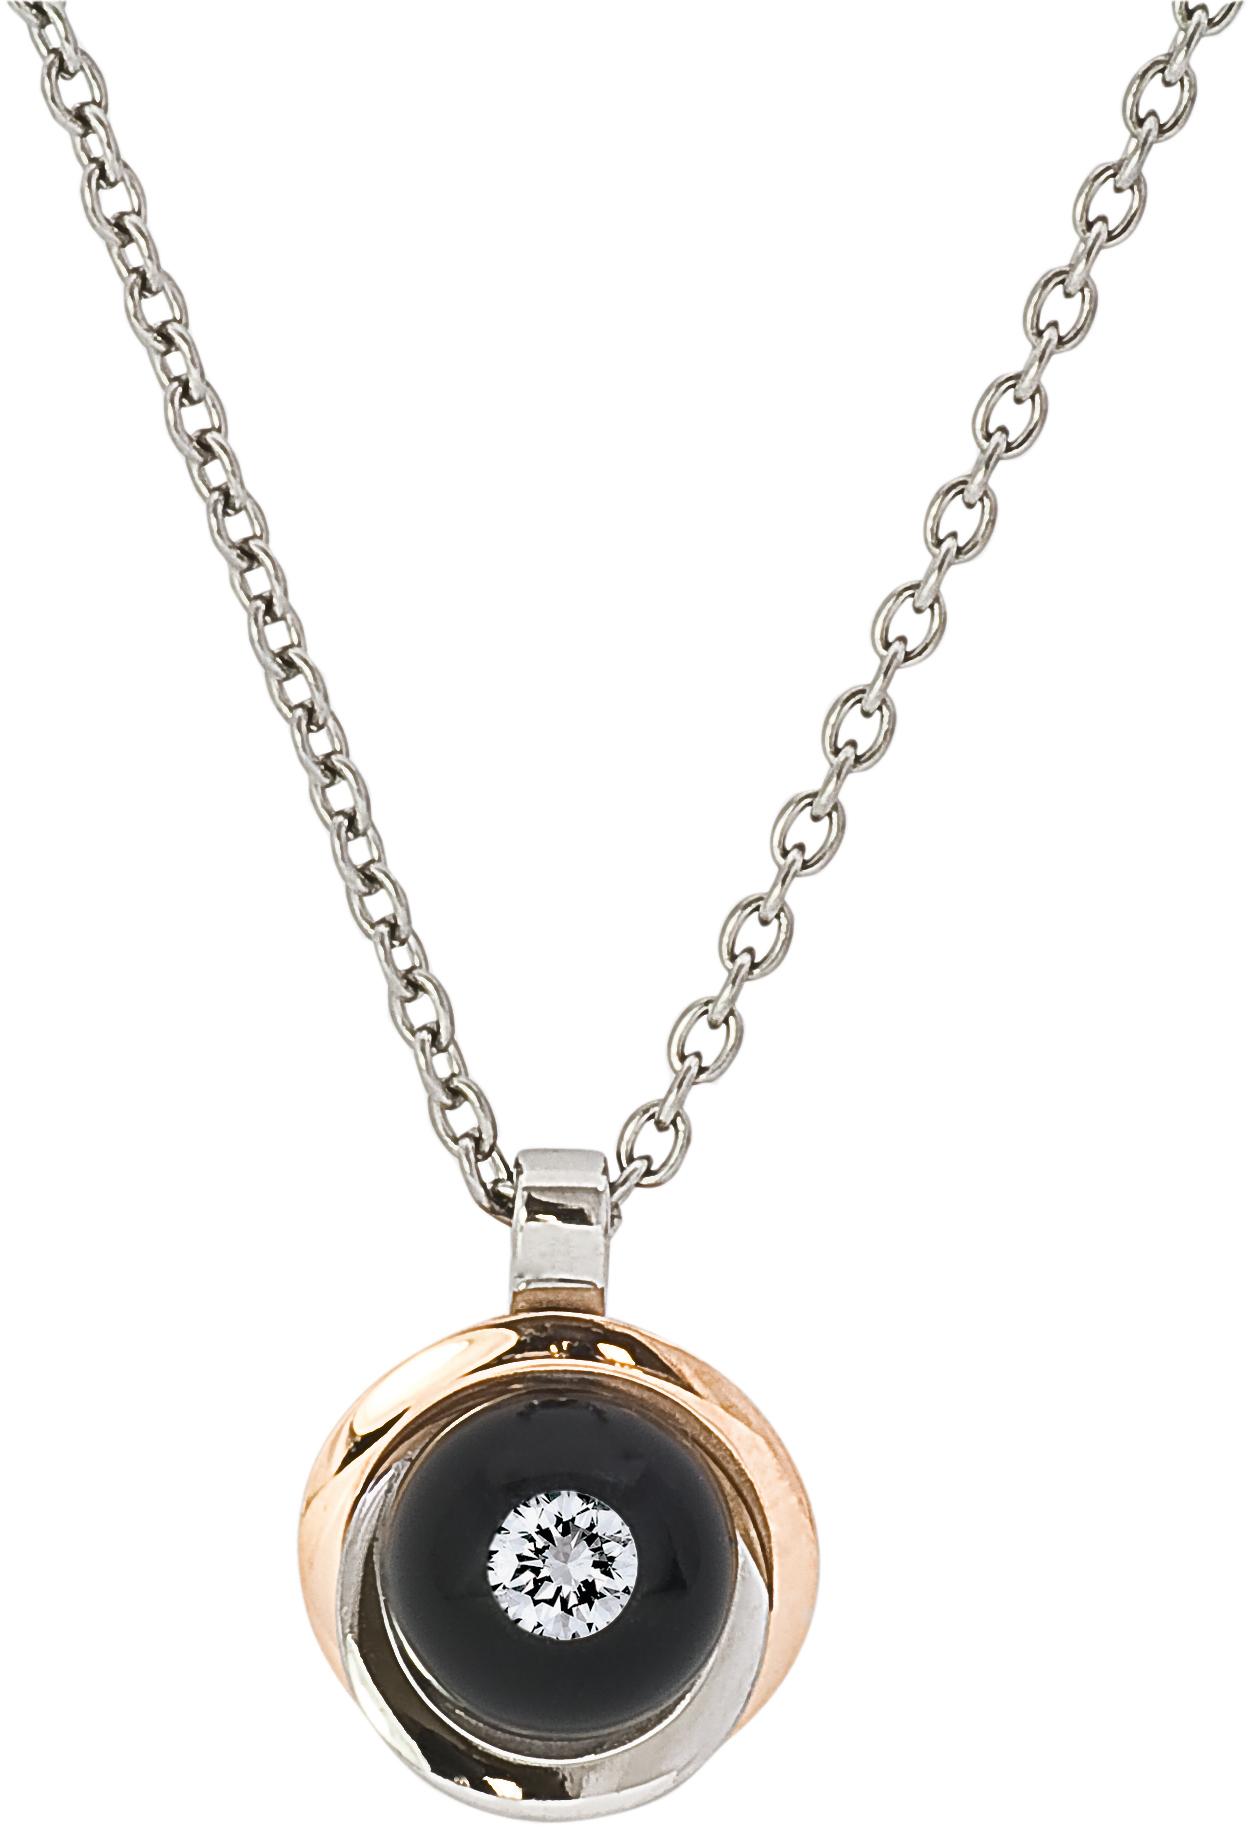 Diamond in glass blossom pendant collection special editon 0.20 cts diamond